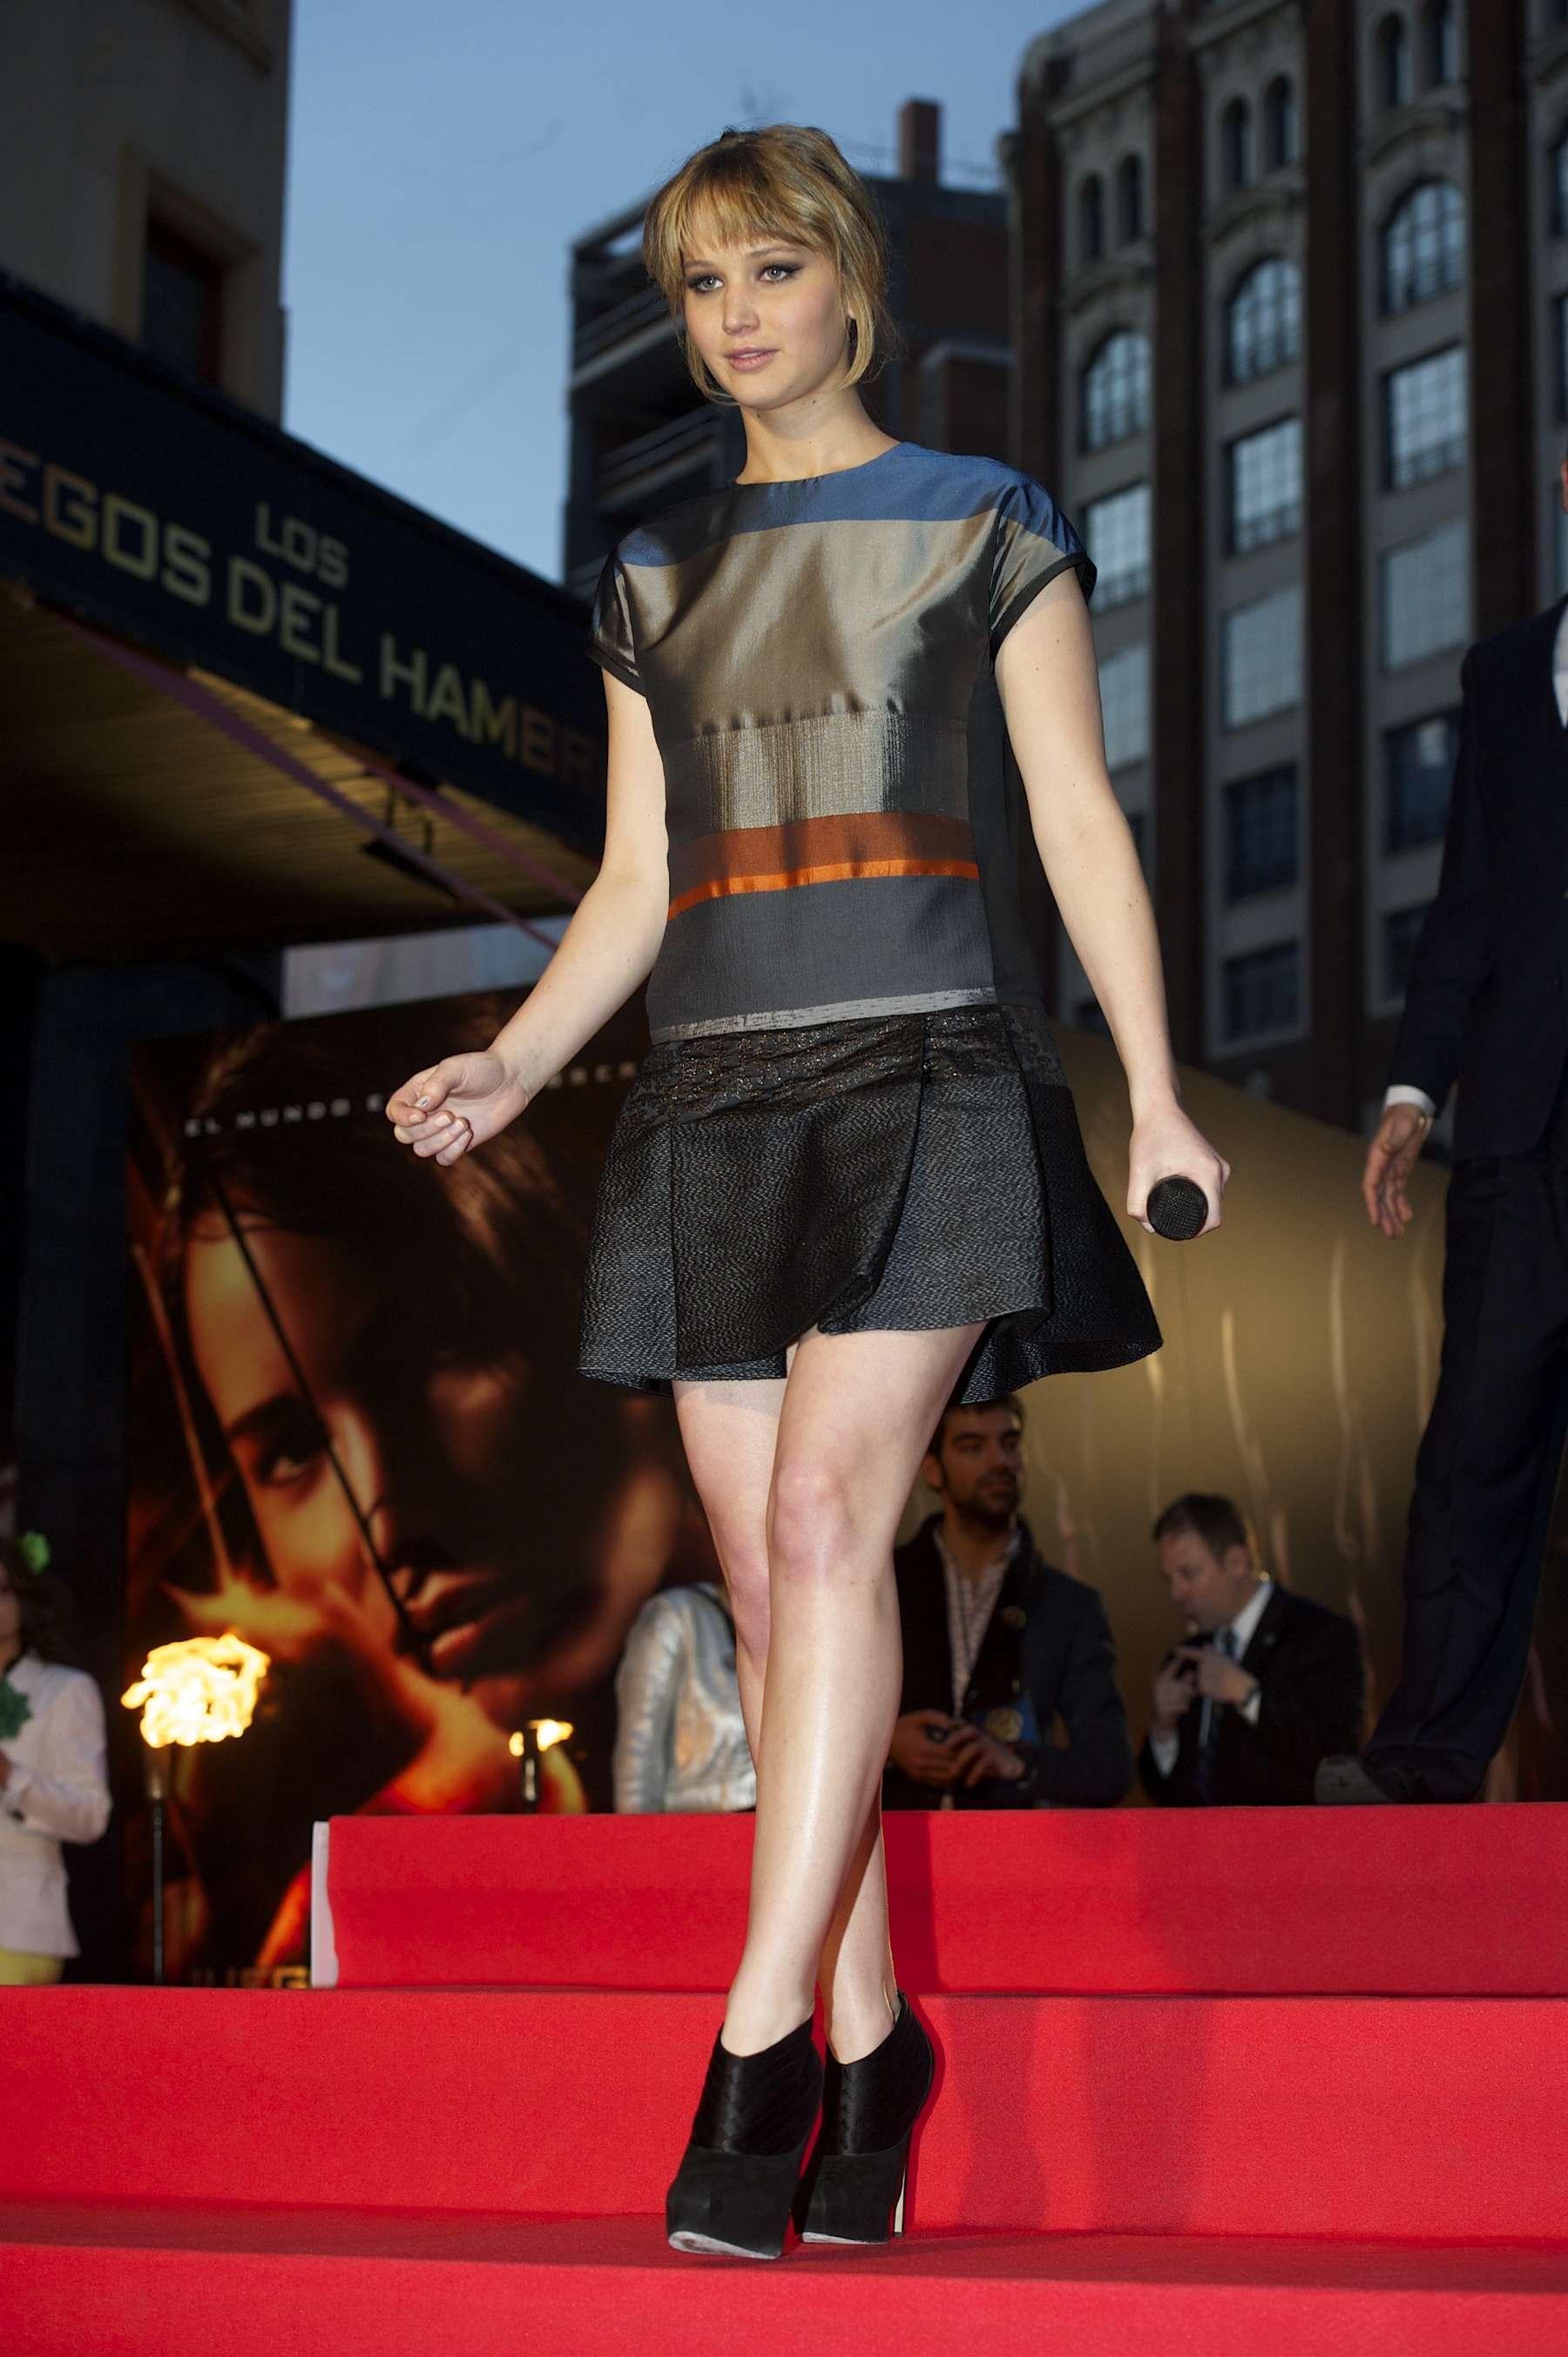 Jennifer Lawrence at The Hunger Games Spanish Premiere - GotCeleb